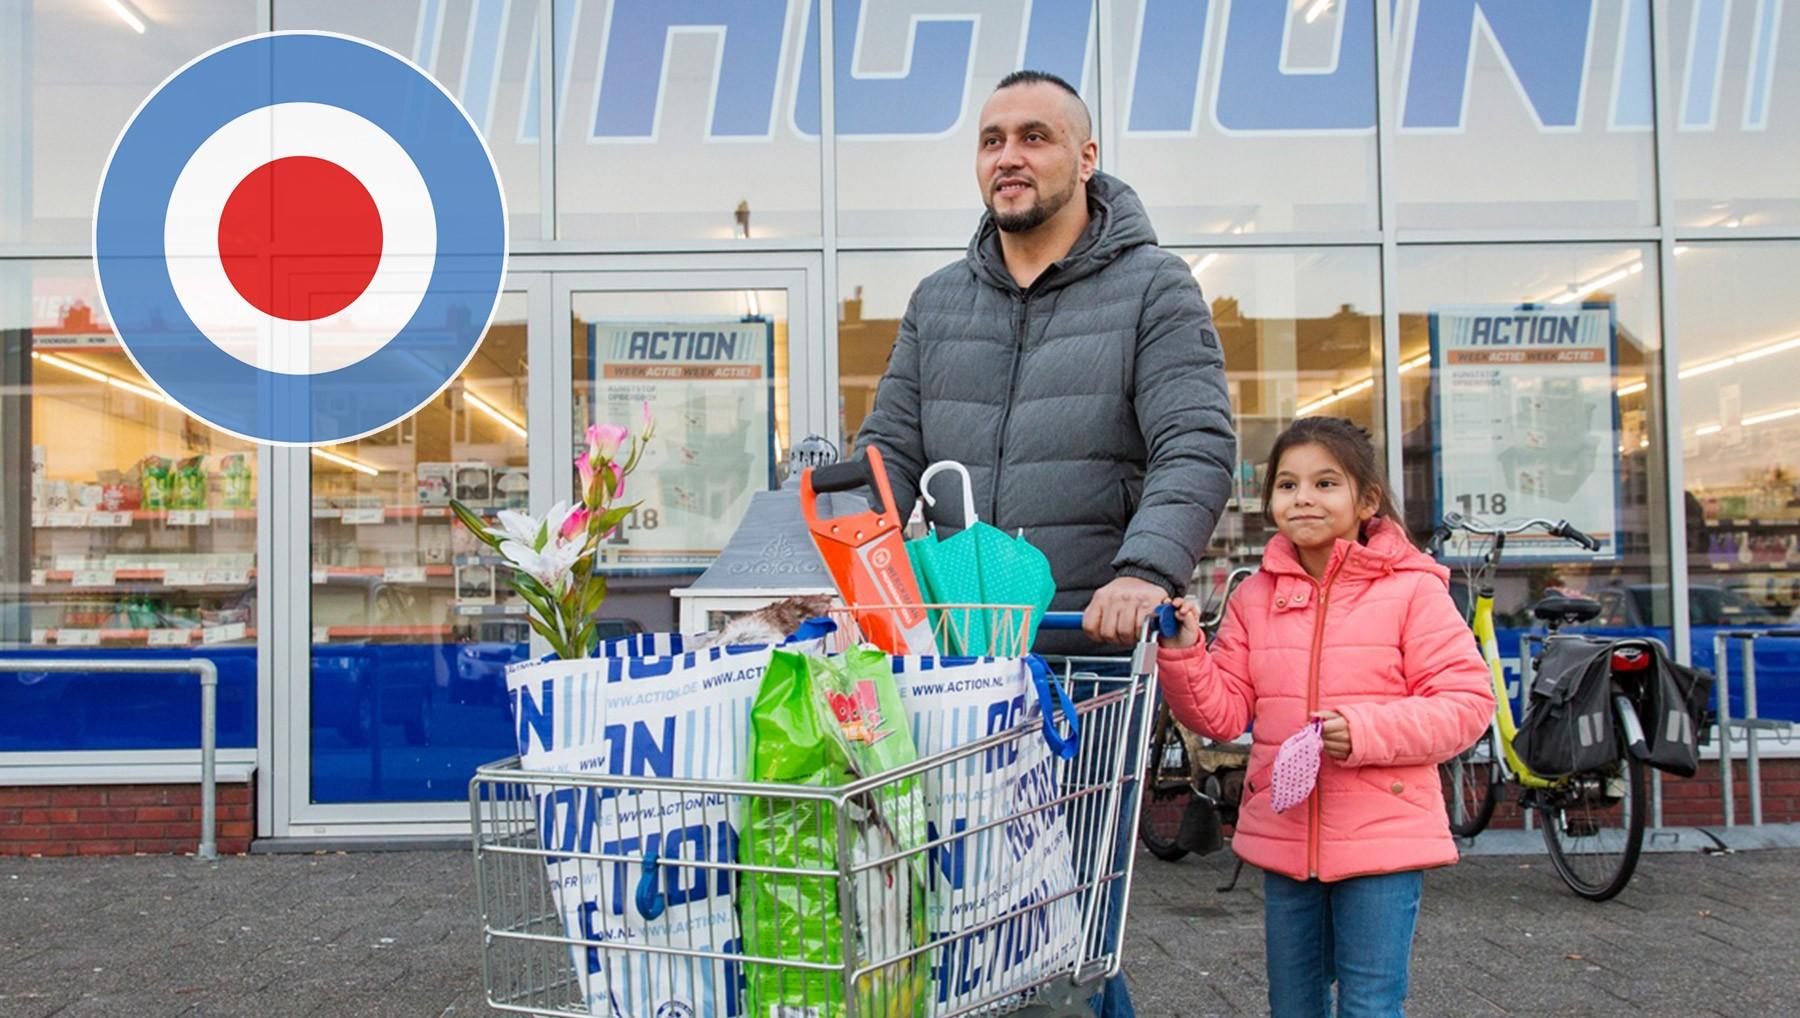 Neue Action Filiale Eröffnet In Der Scs City4u Kroneatcity4u